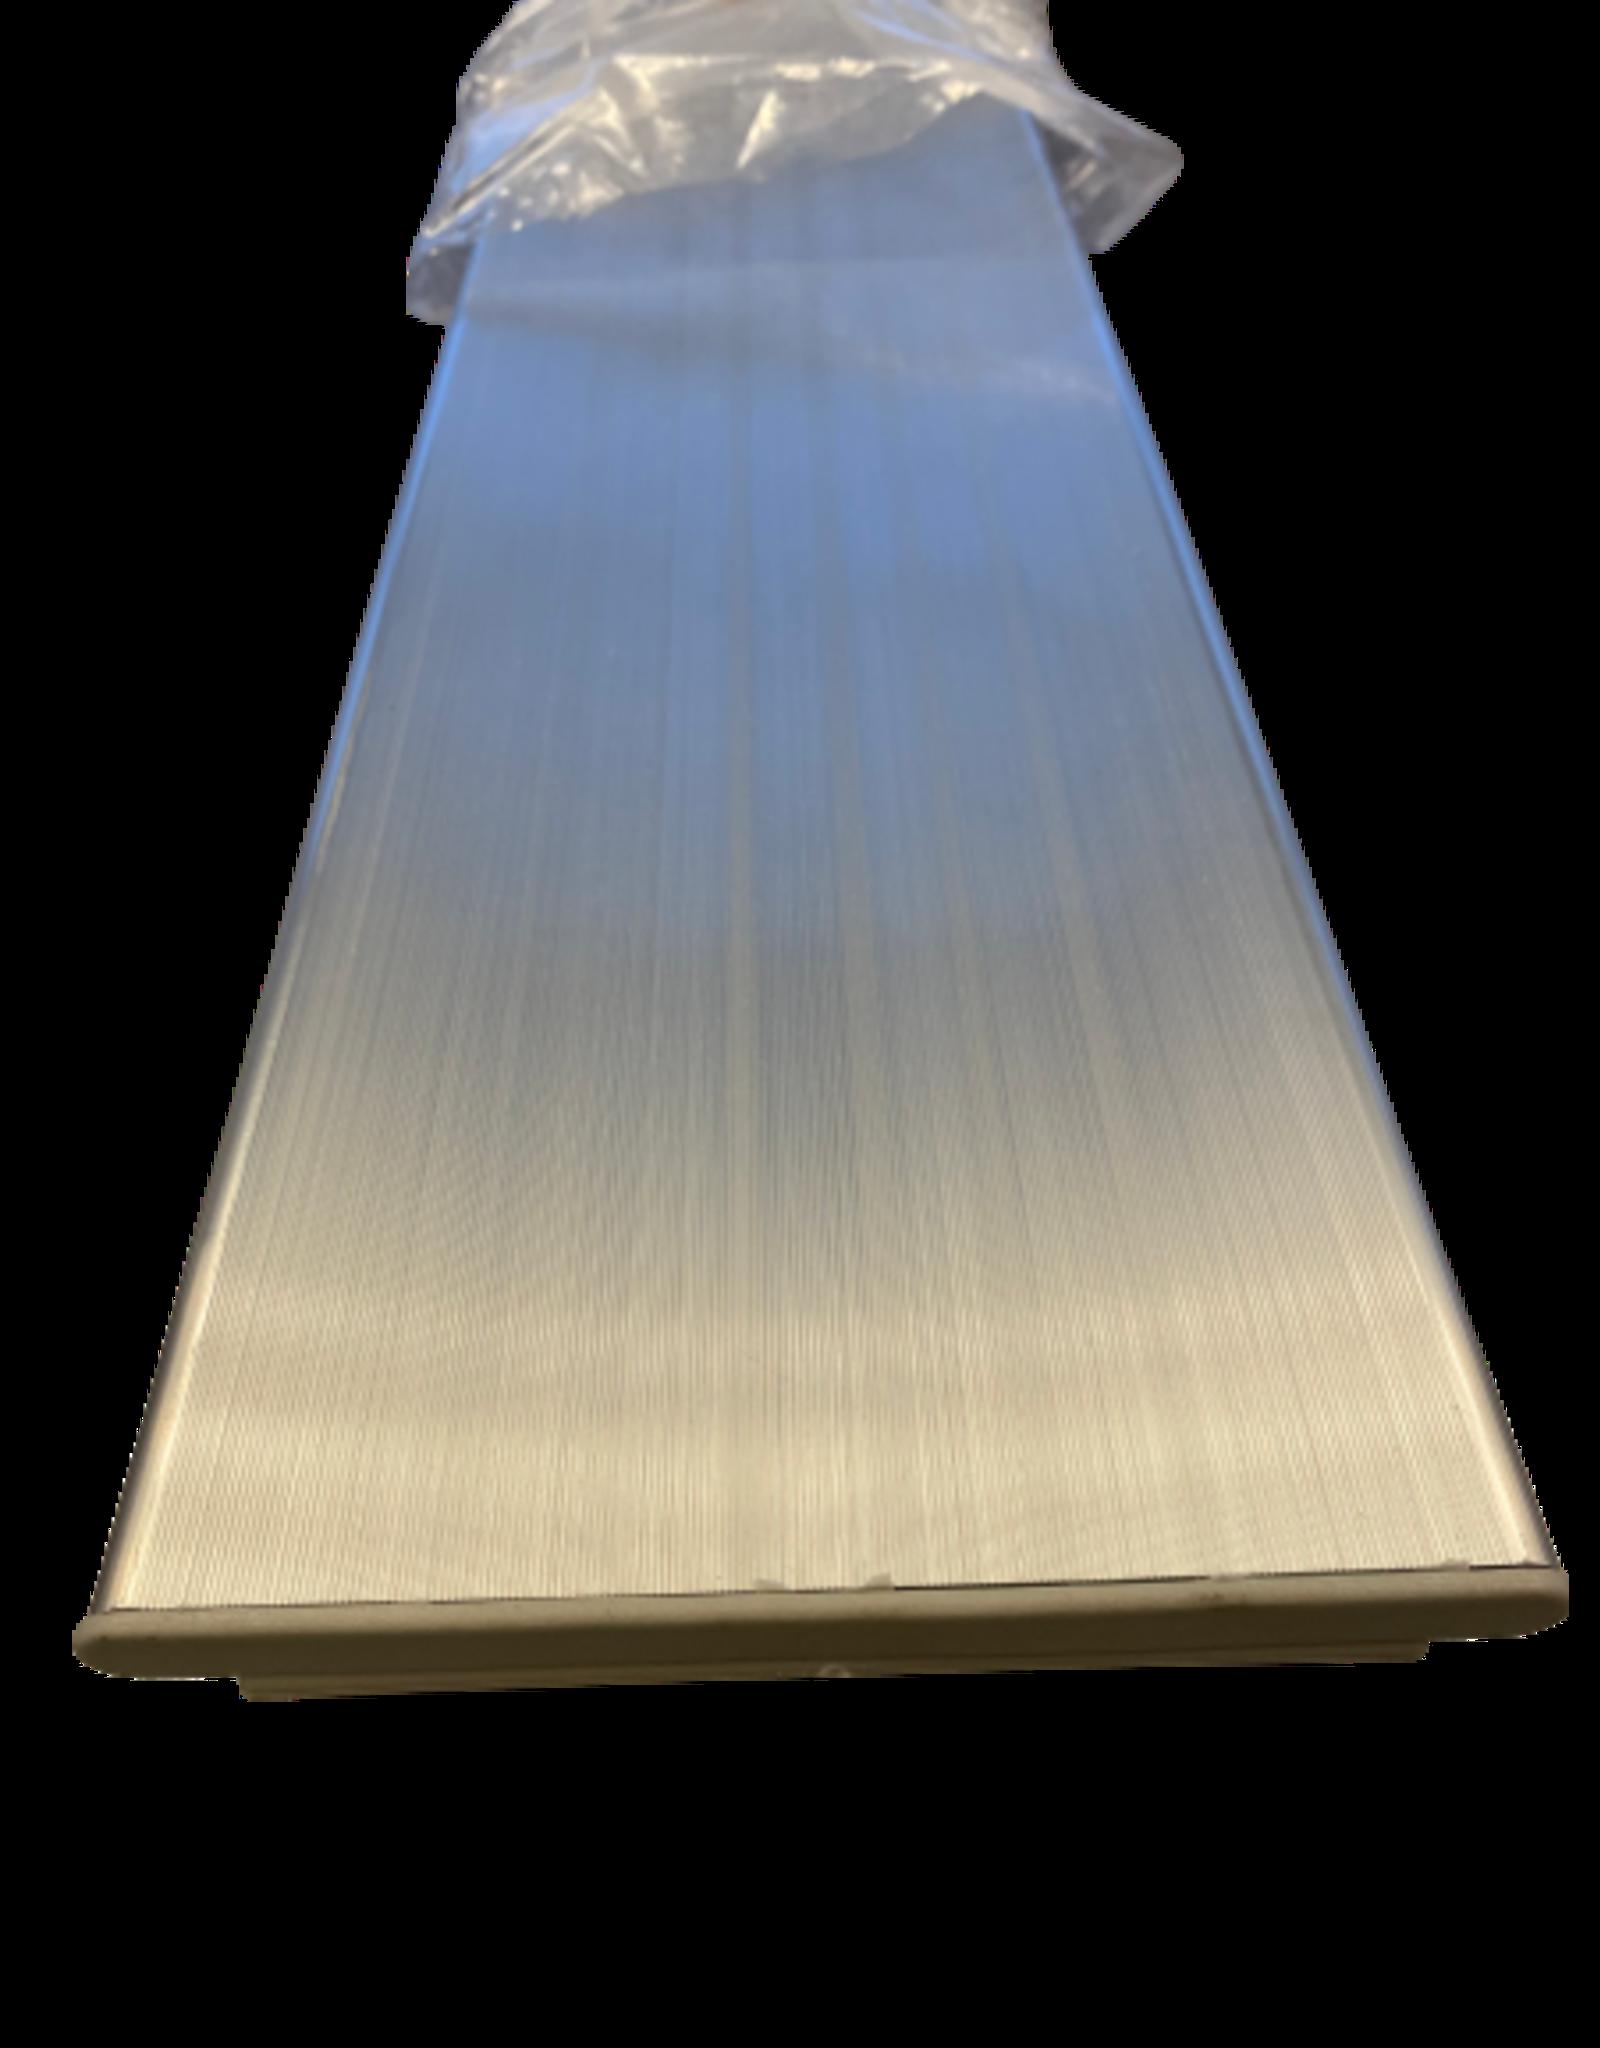 Zodiac Zitplank aluminium 90cm - Cadet Roll Up / ALU / AERO - 270 - 310